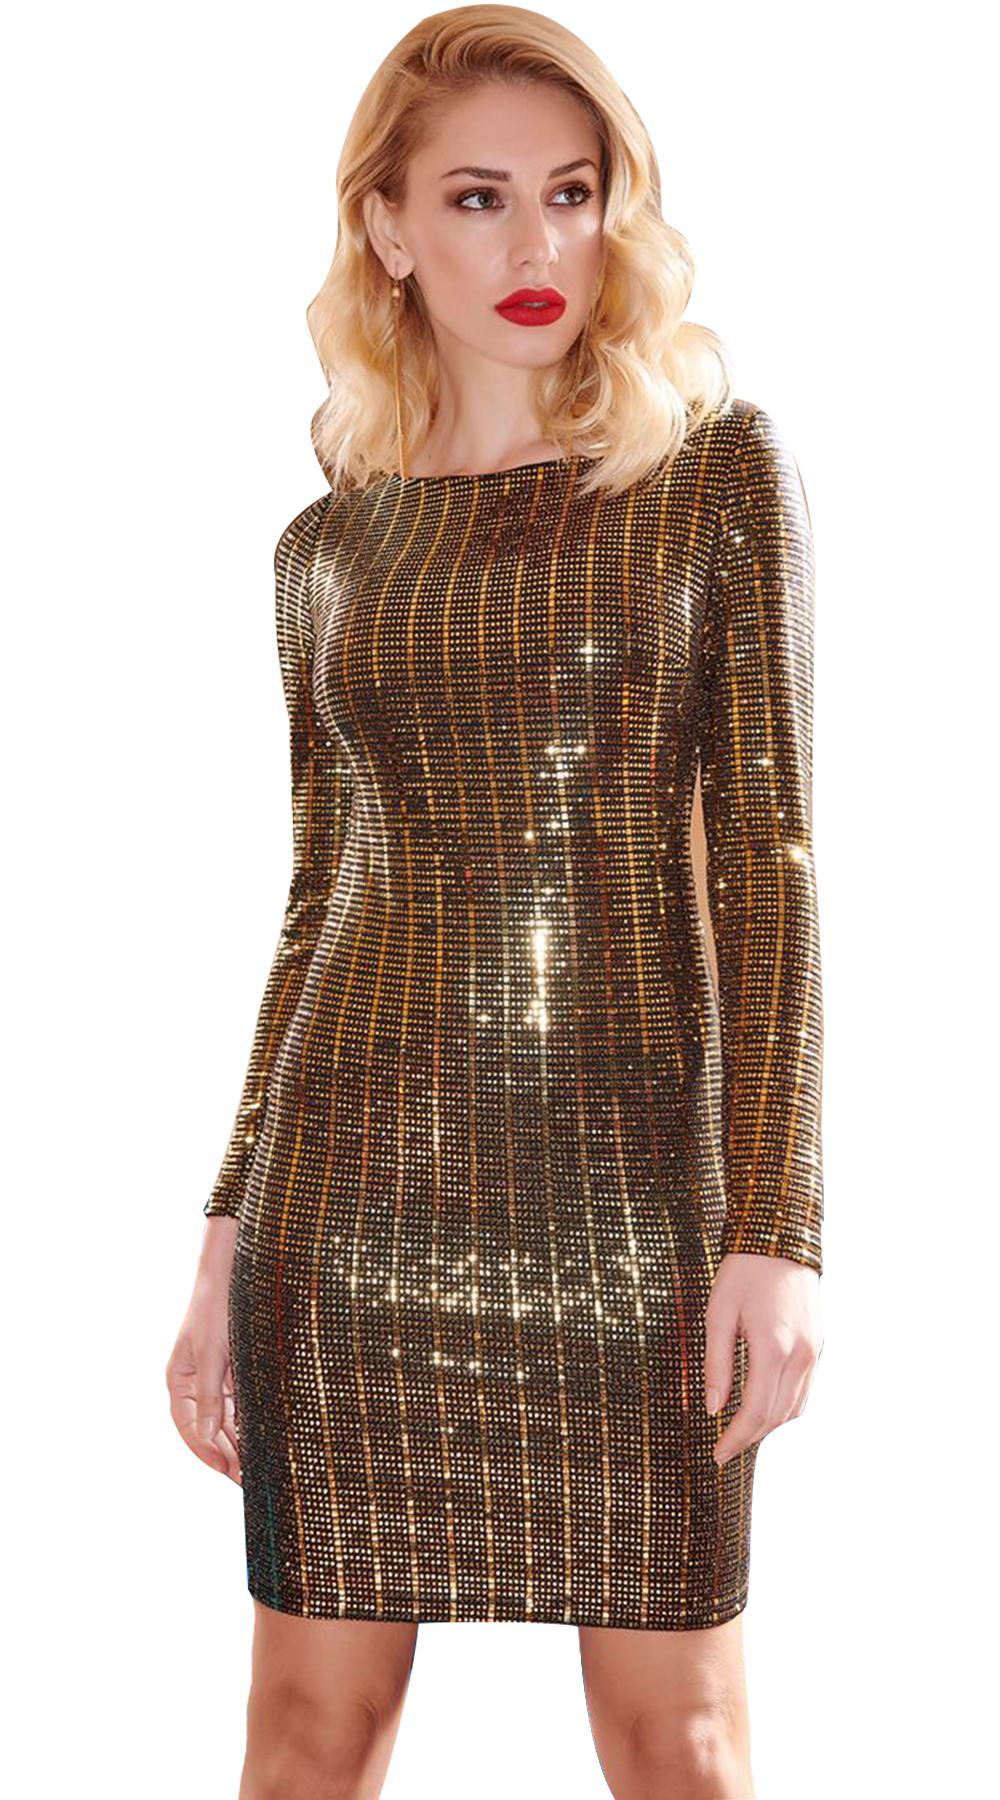 Sparkling Bodycon Φόρεμα με ανοιχτή πλάτη - LOVE ME - W18LV-5694983 glam occassions wedding shop